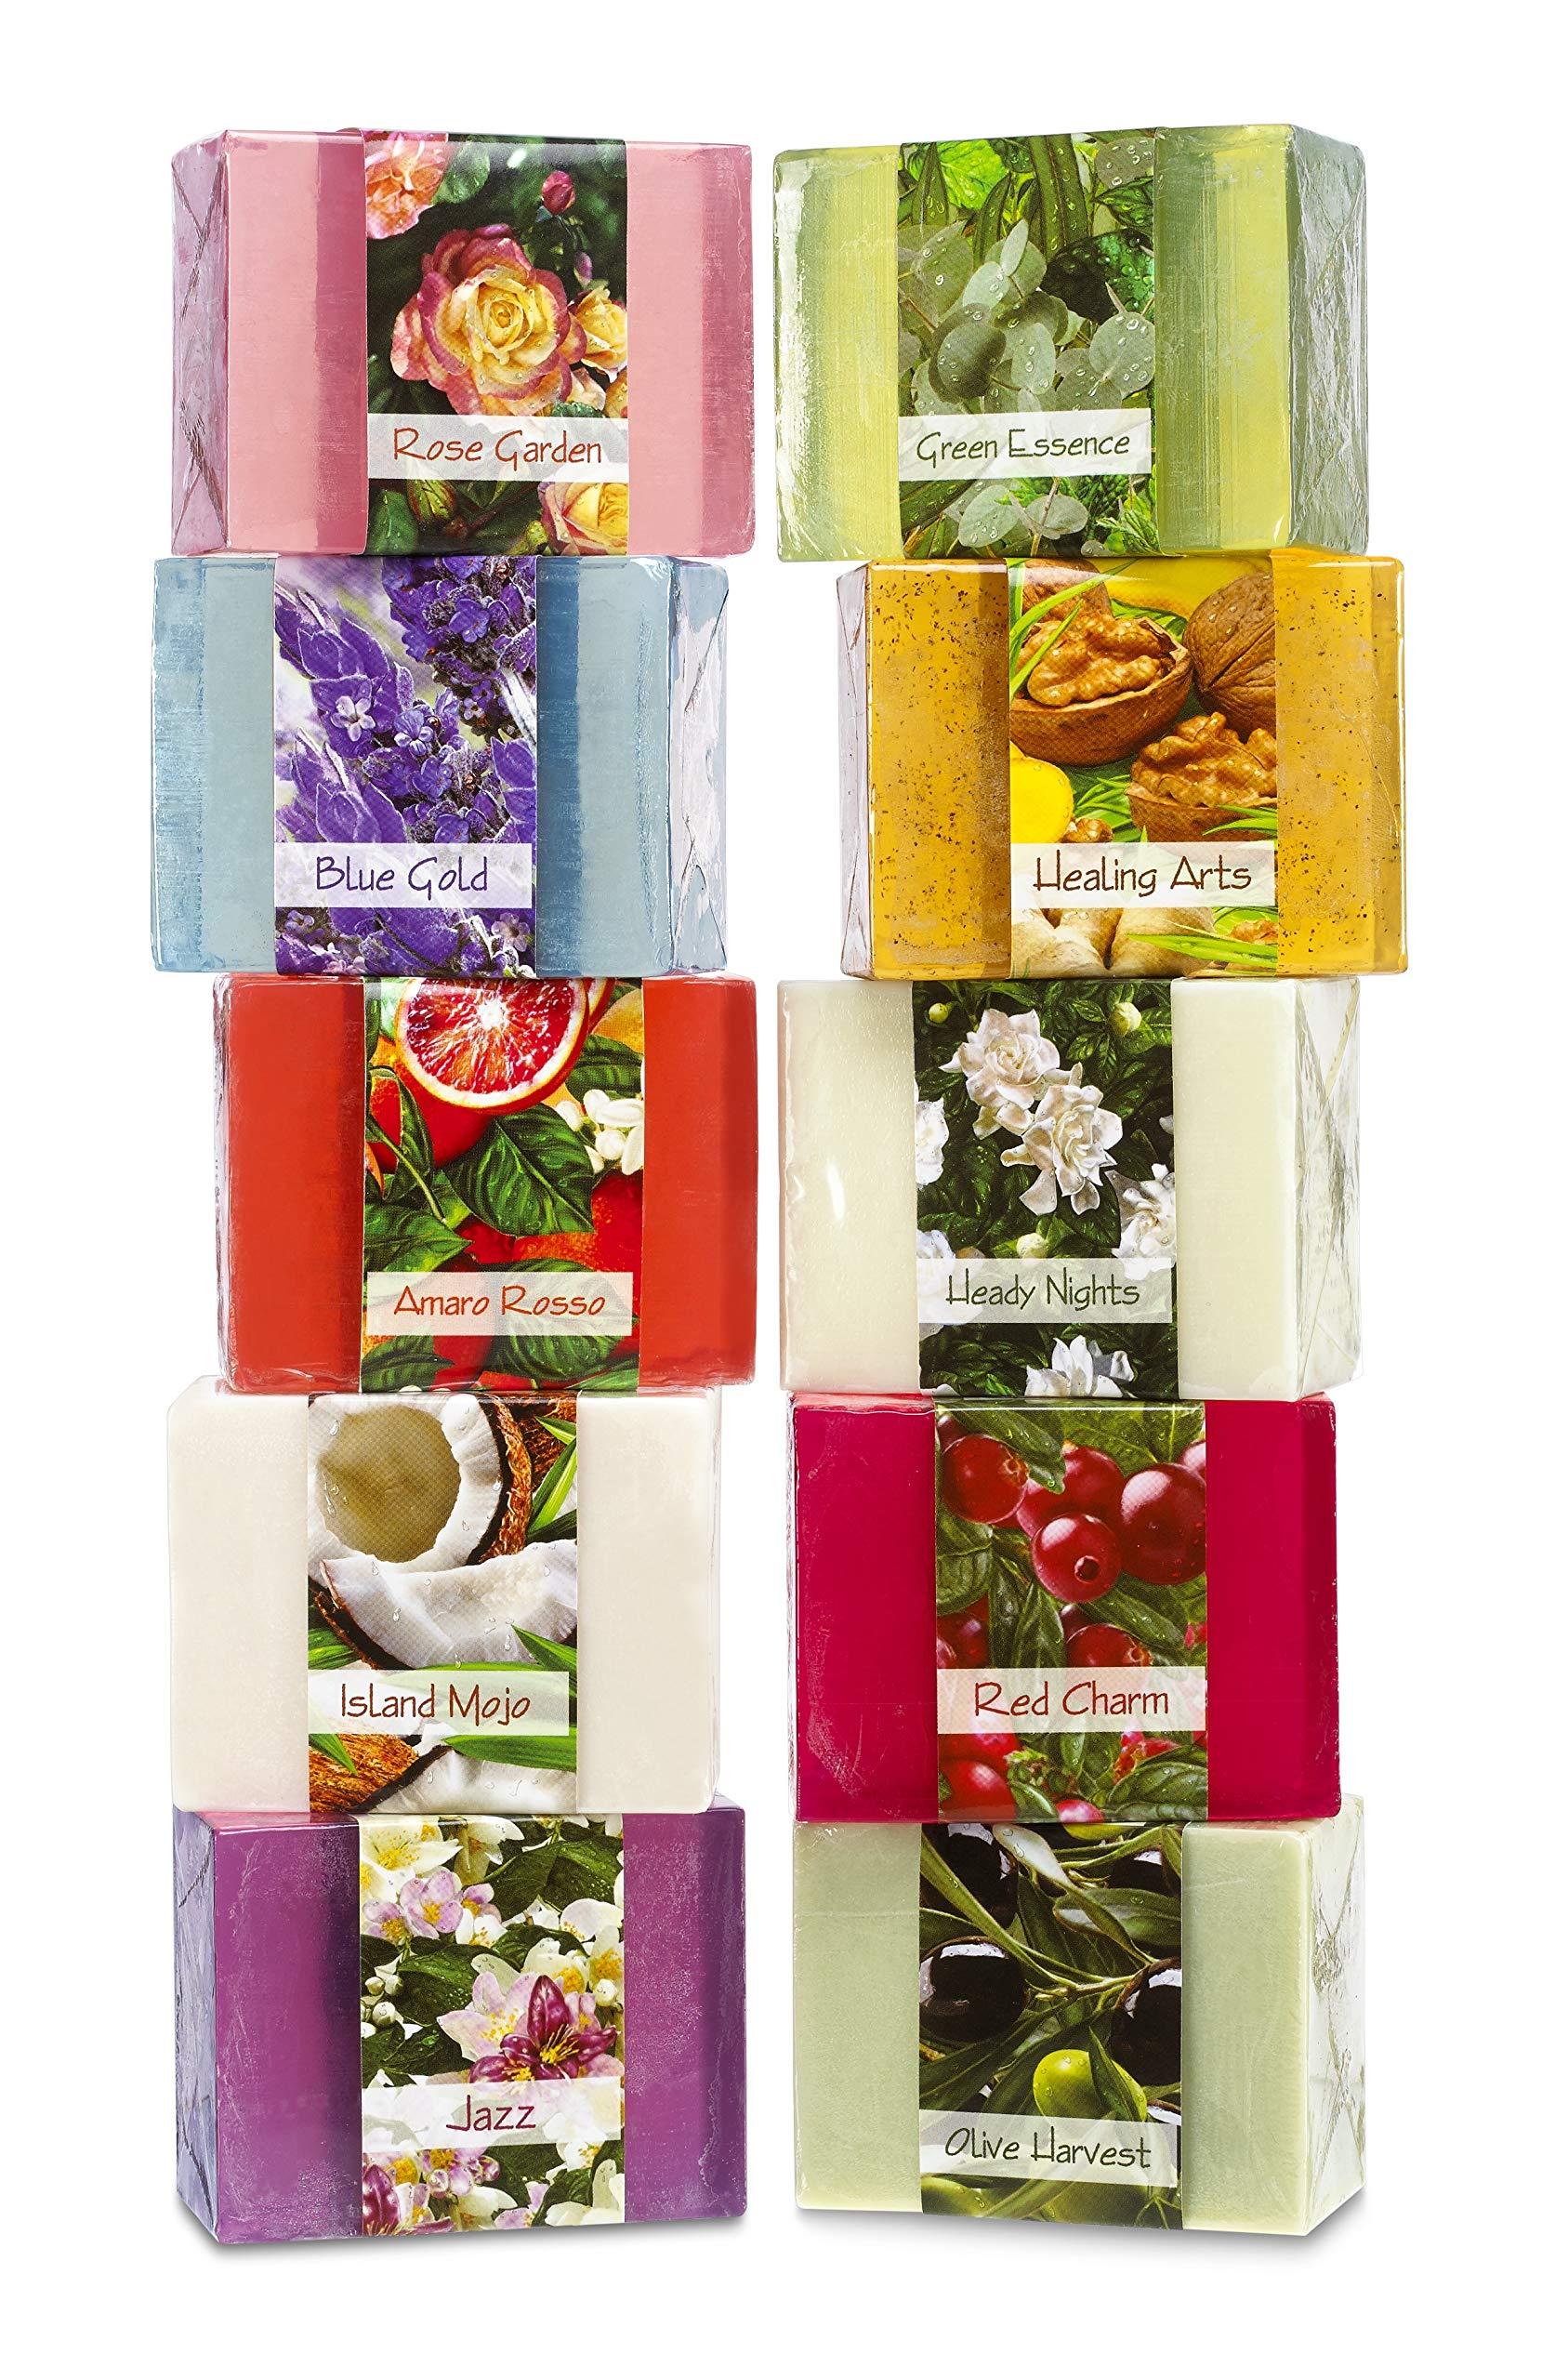 Full Bloom Vegetable Glycerin Bar Soap, 10 Bar Sampler Set 2, Amaro Rosso, Island Mojo, Red Charm, Blue Gold, Healing Arts, Rose Garden, Olive Harvest, Jazz, Green Essence, and Heady Nights